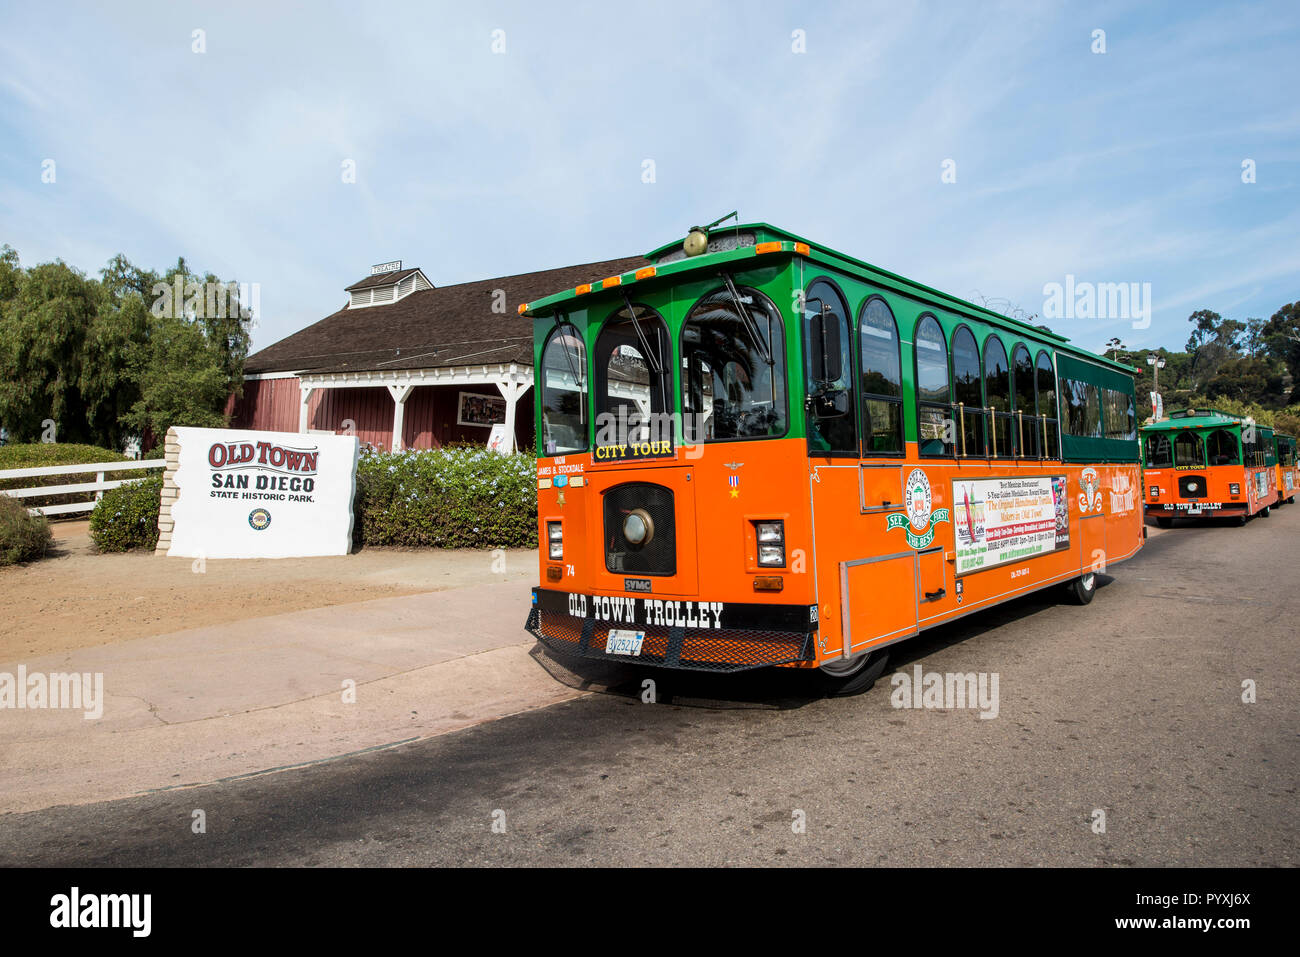 City Tour Trolley Old Town, San Diego, California. - Stock Image